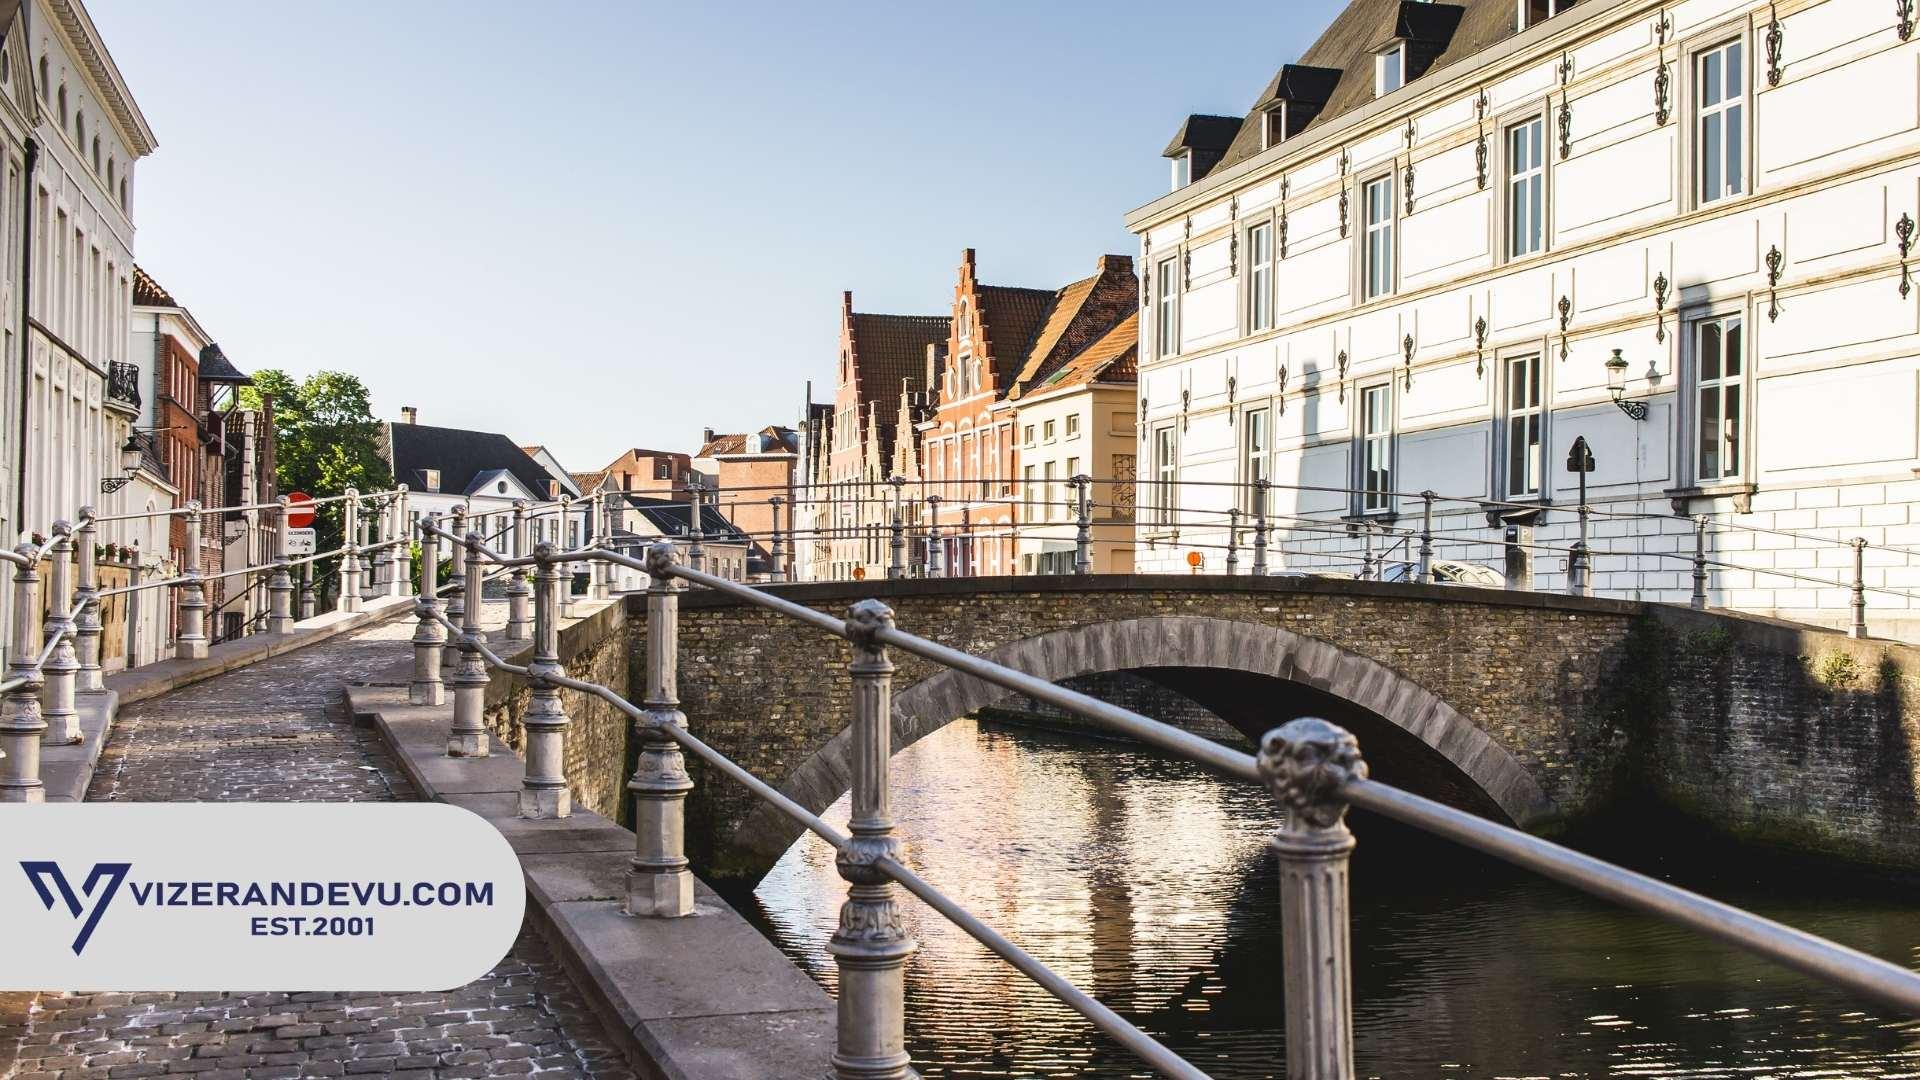 Belçika Schengen Vizem İptal Olur Mu?